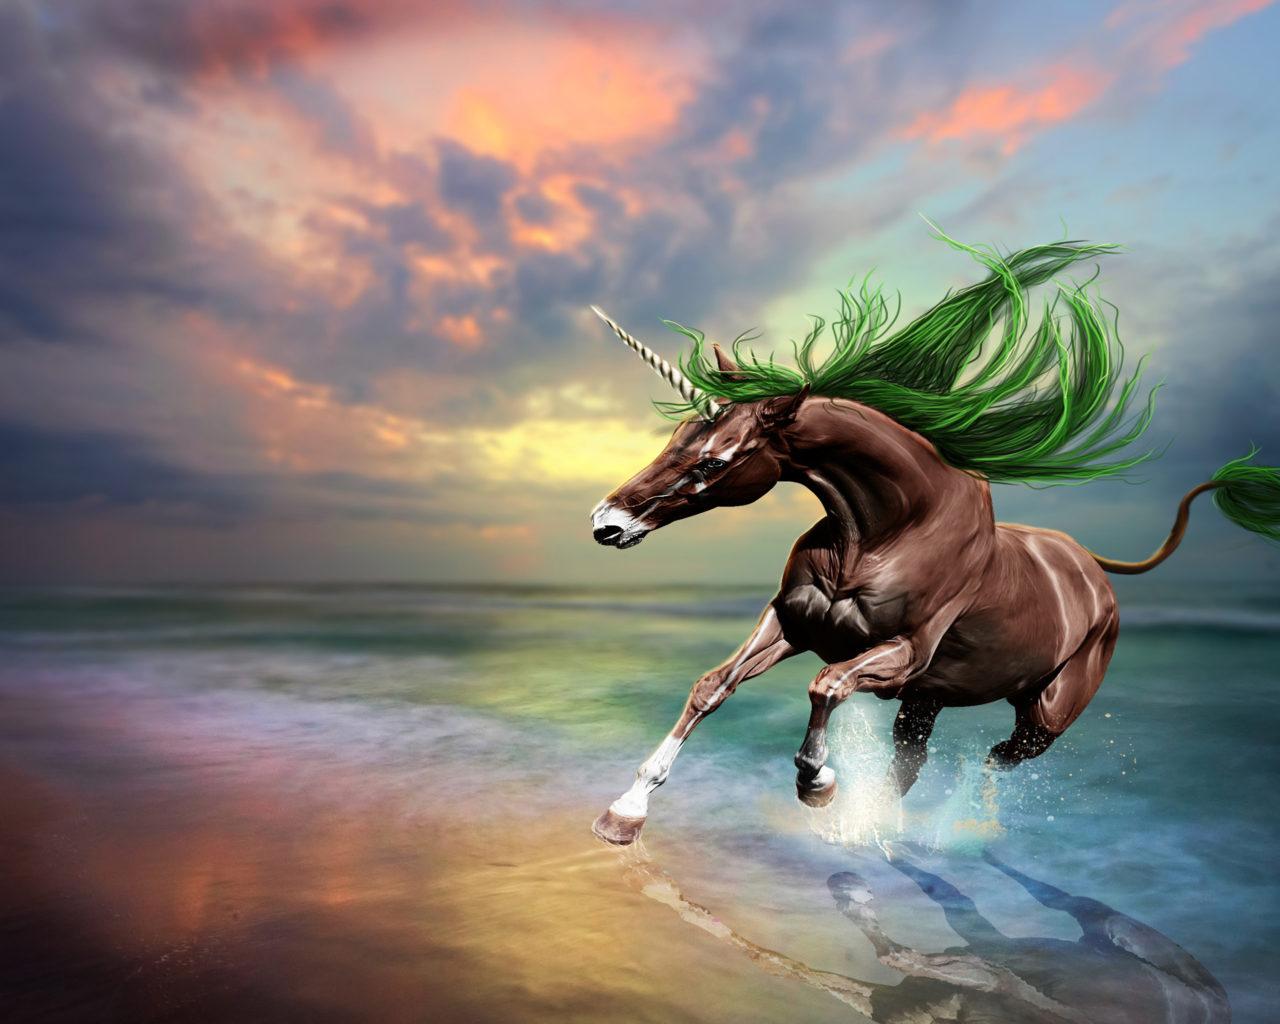 Animated Sunset Wallpaper Brown Horse Unicorn Art Digital Imaging Beach Sunset